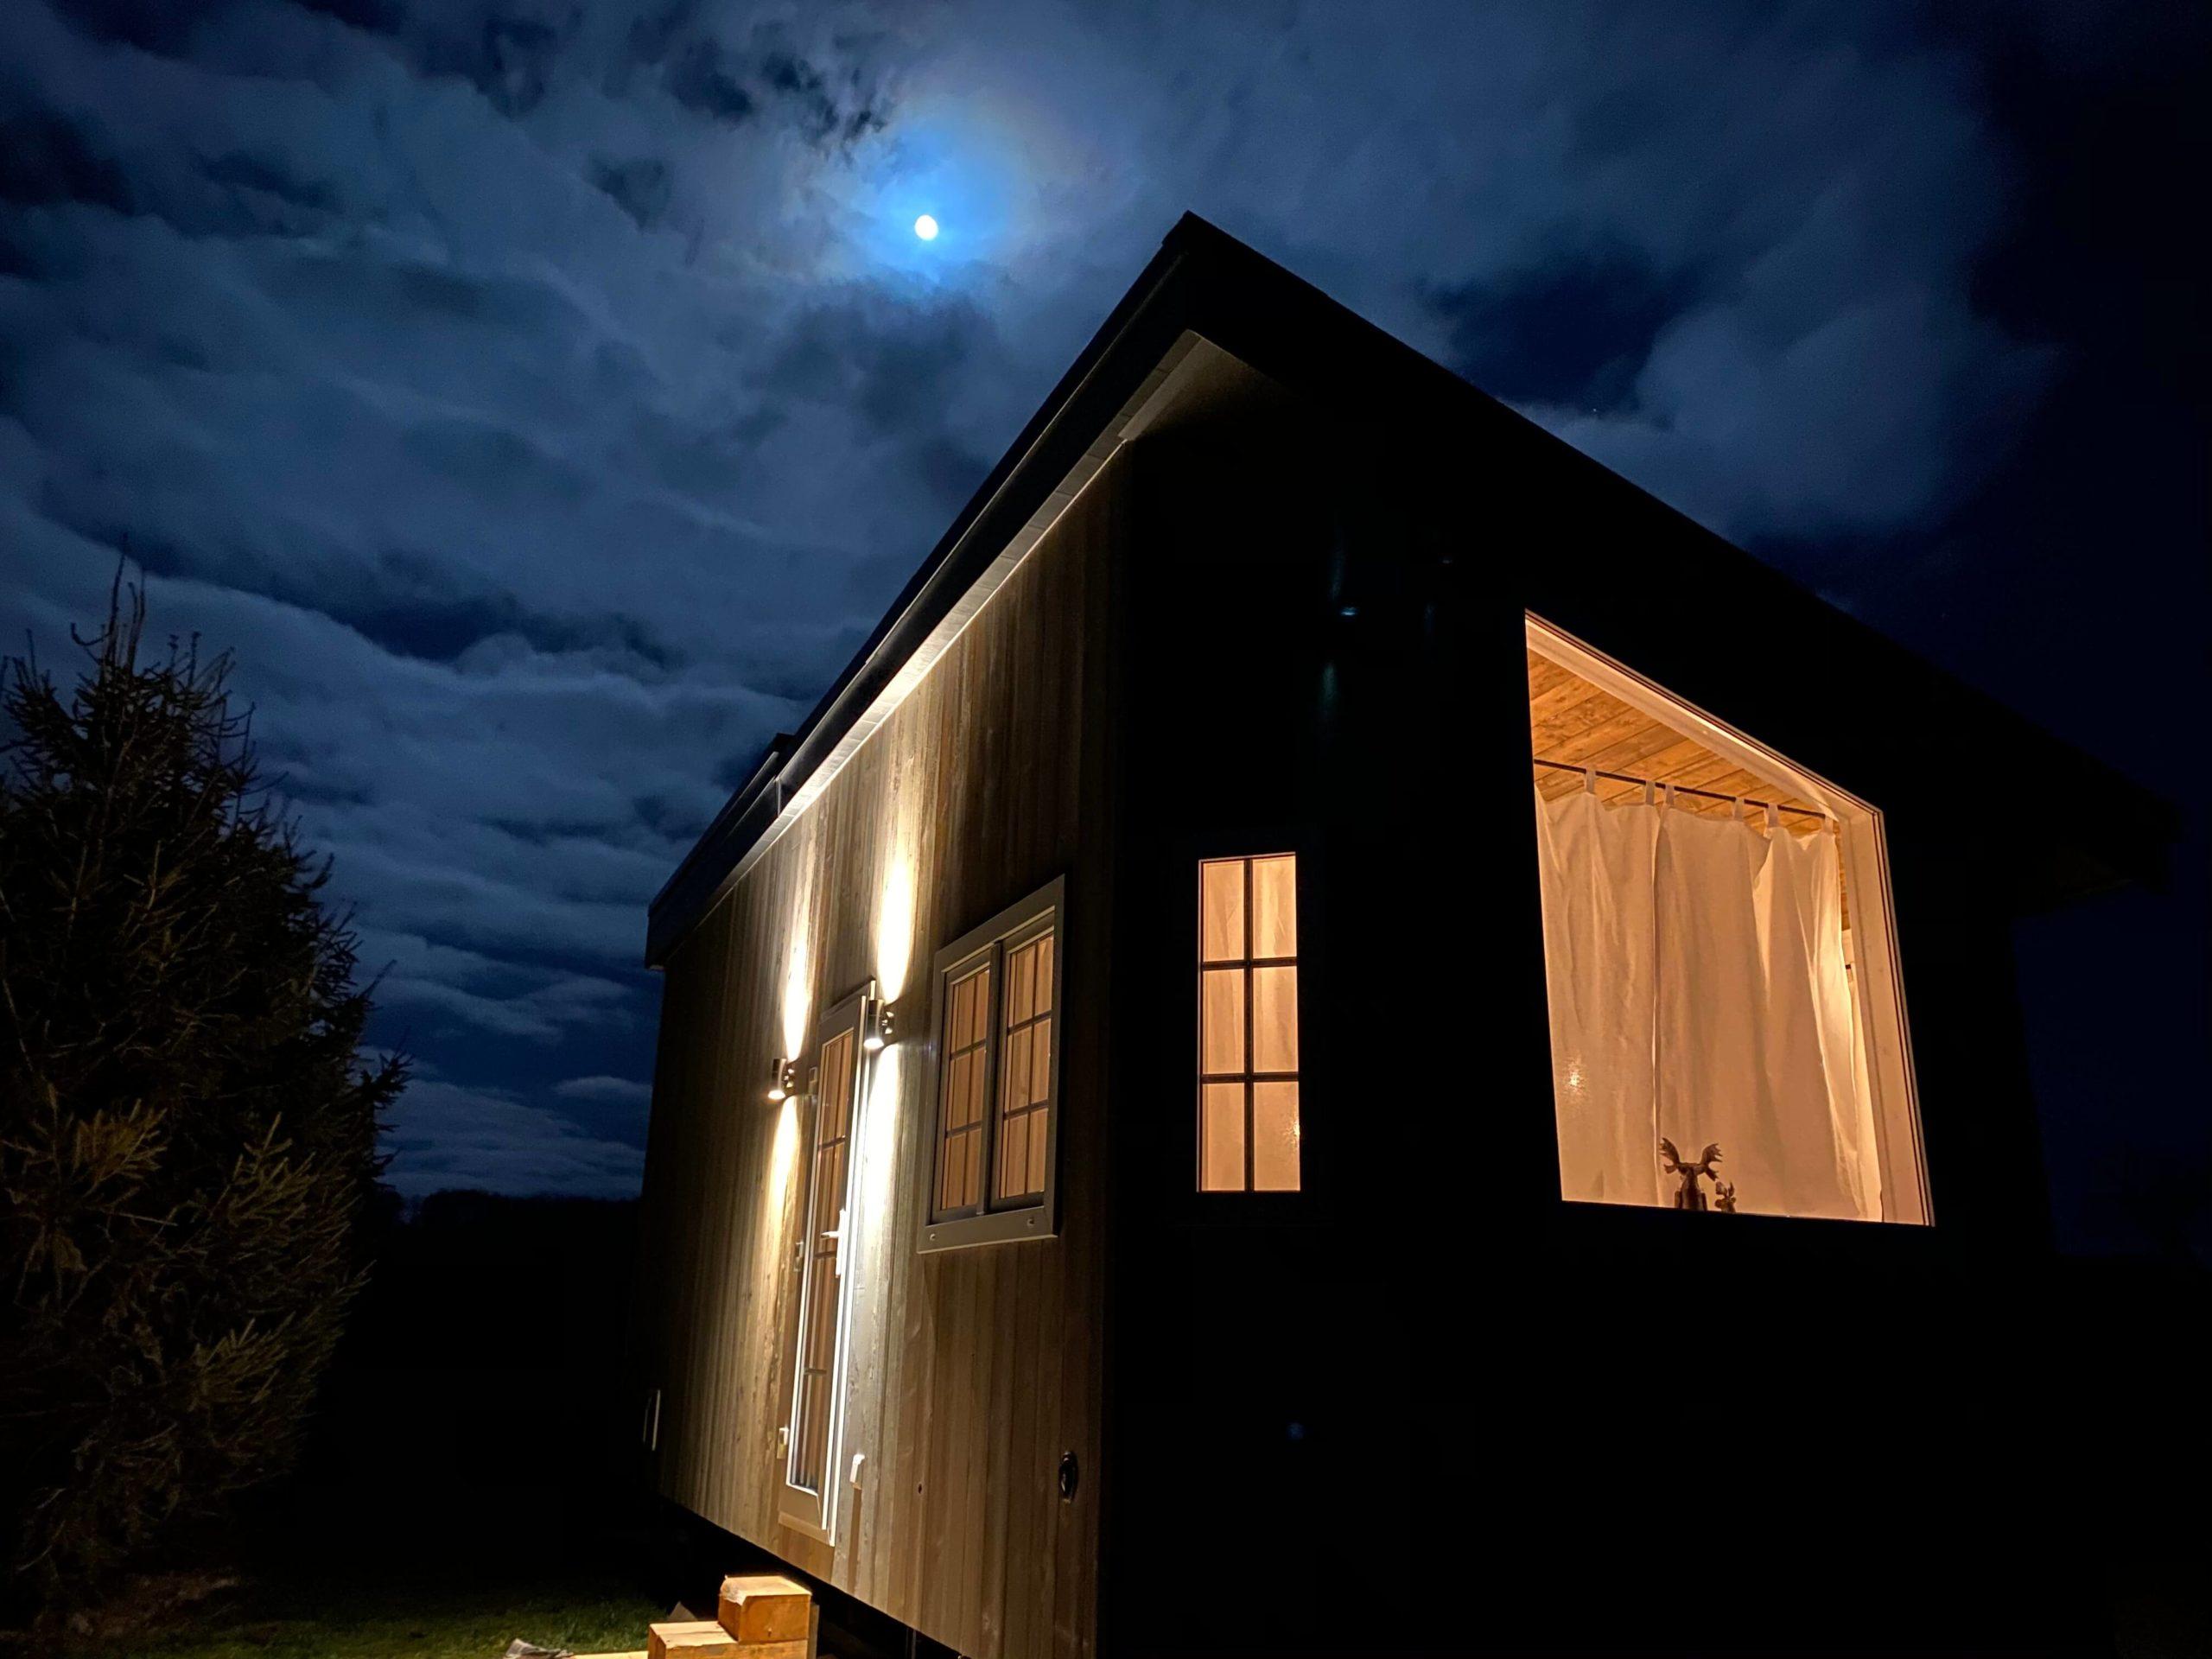 mobiles-tiny-house-lappland-vital-camp-gmbh-05